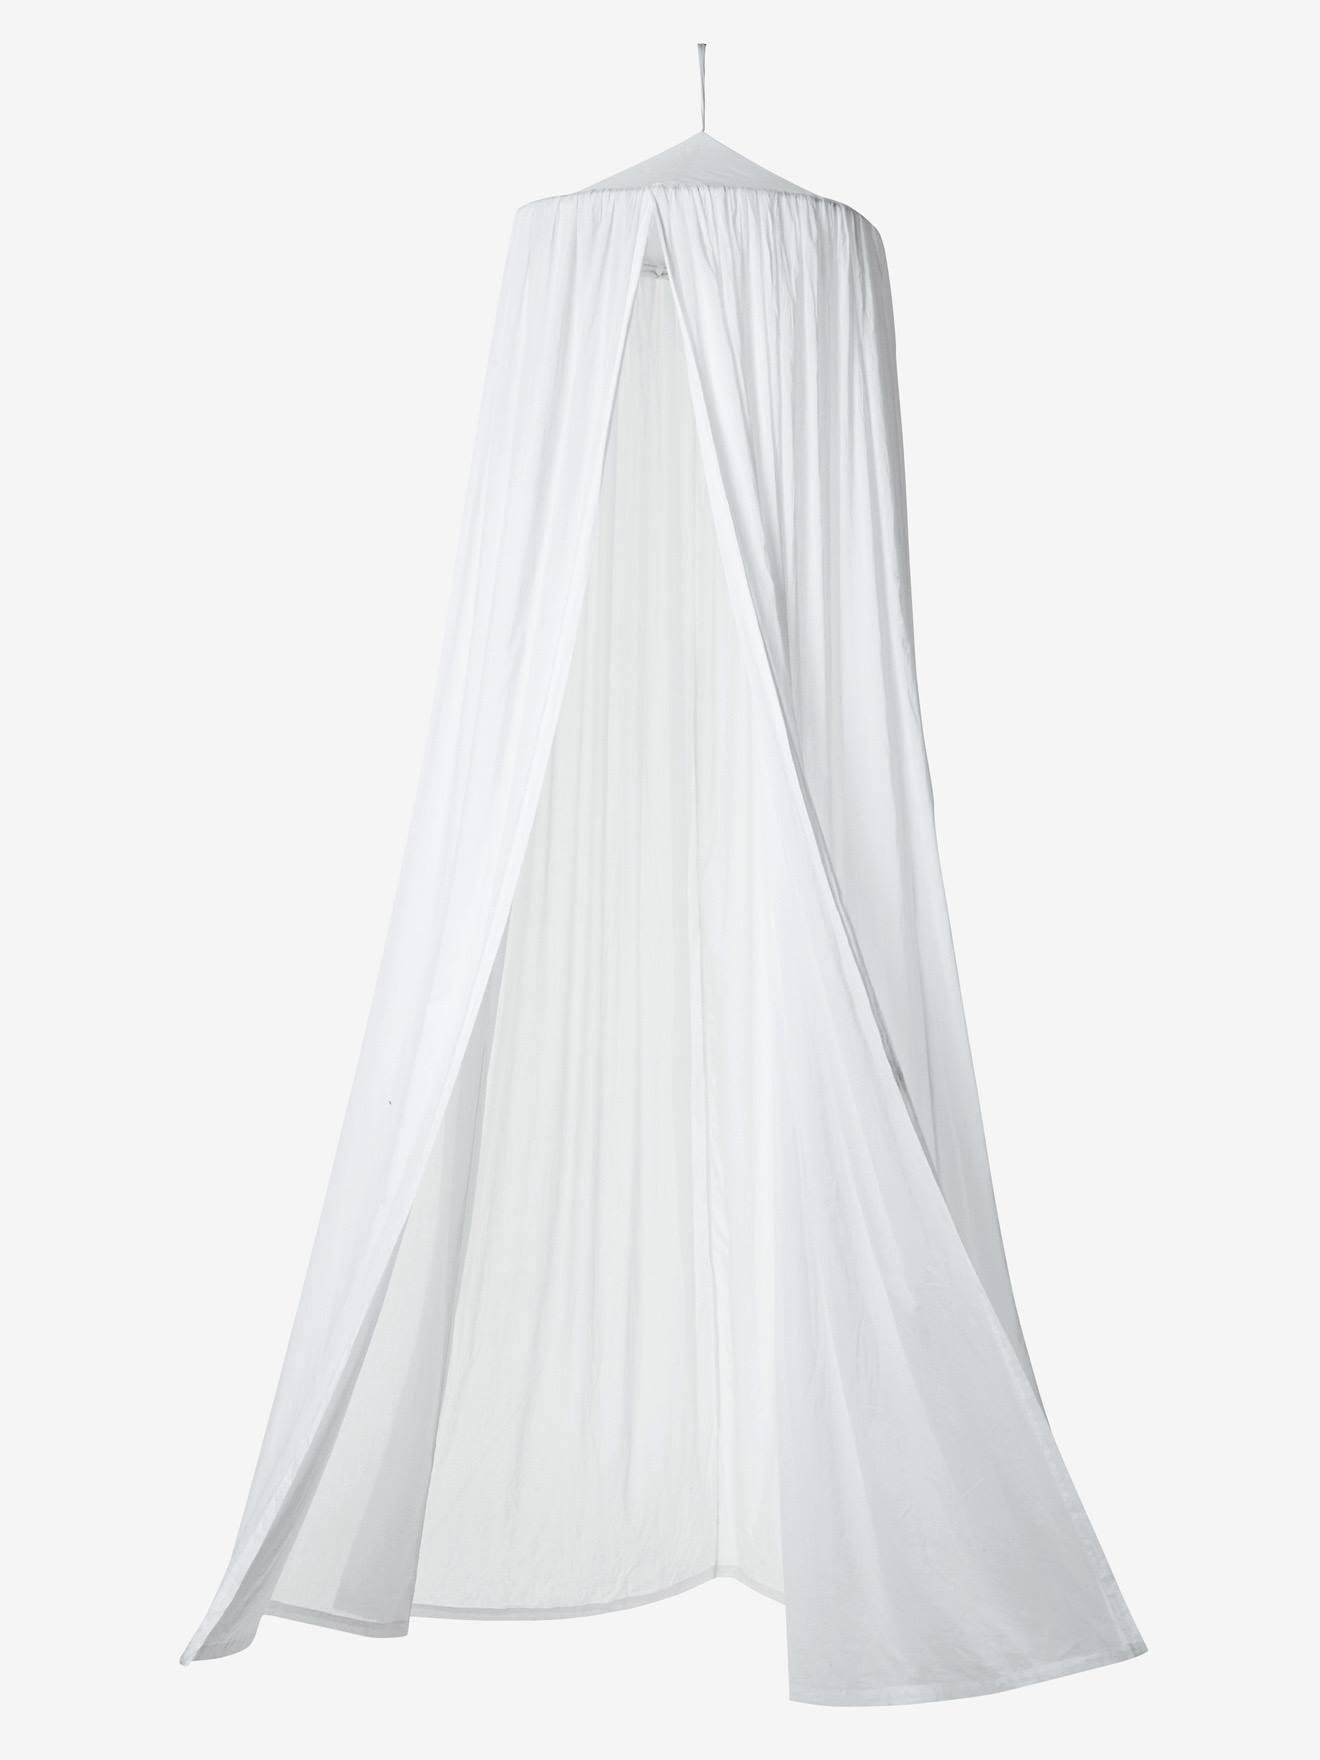 Canopy Curtain White - vertbaudet enfant & Canopy Curtain - white Decoration